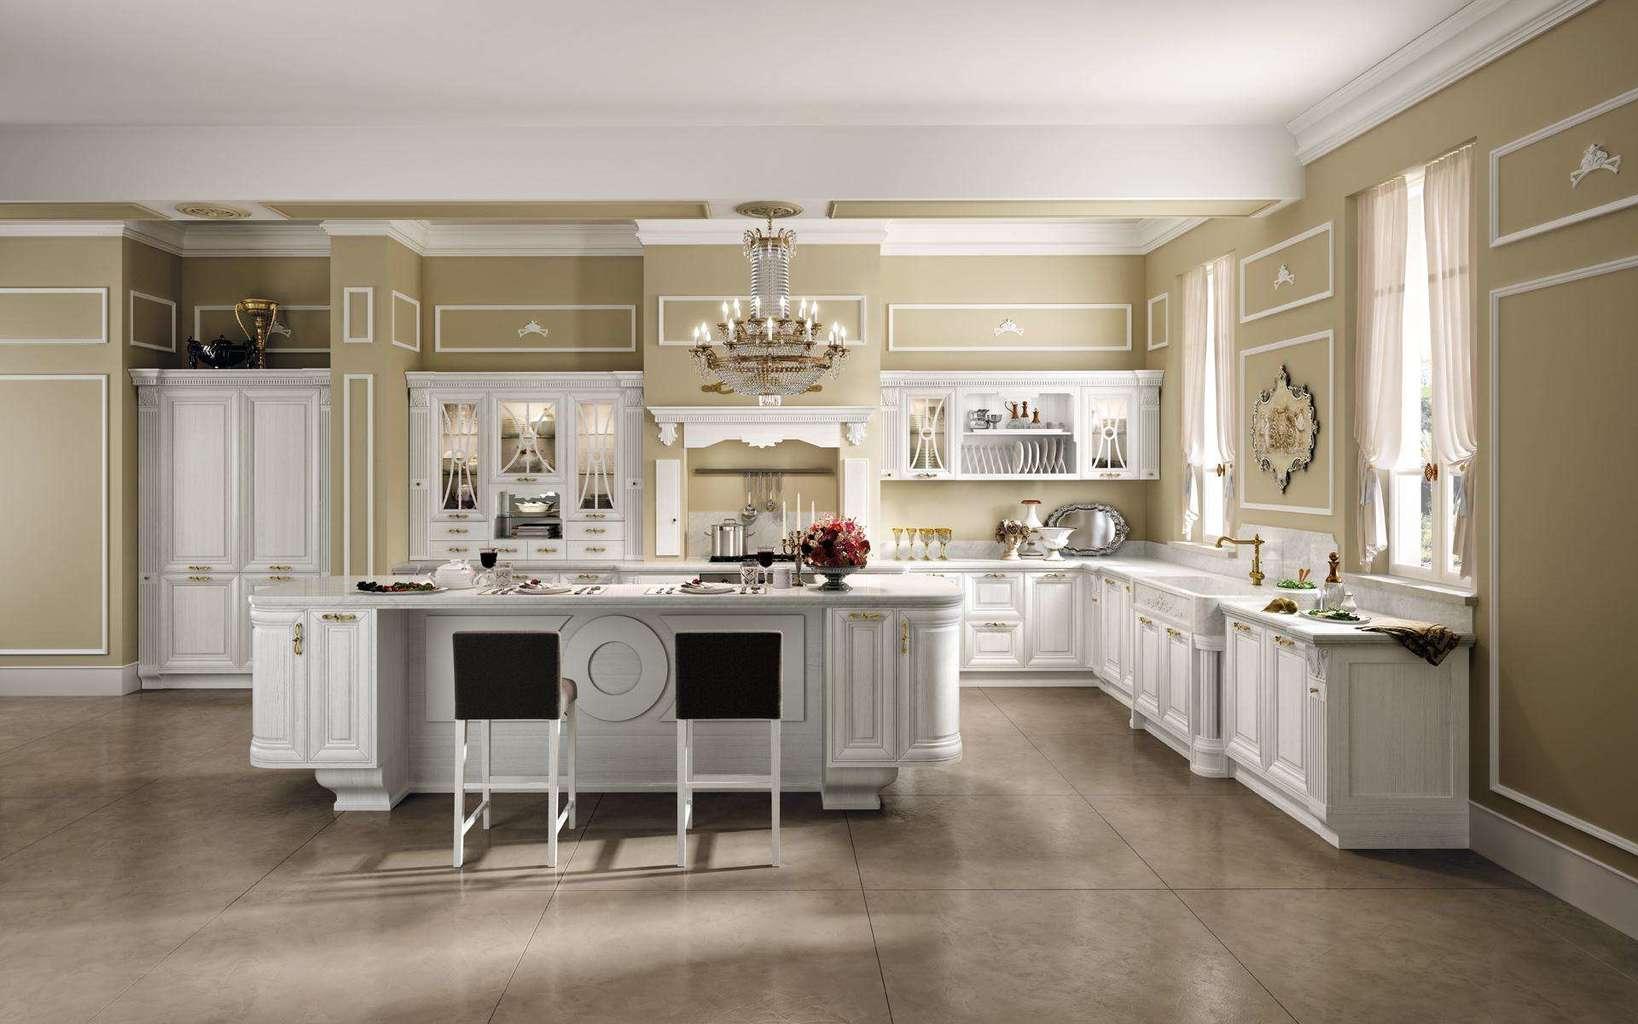 Awesome Due Palme Arredamenti Ideas - Amazing House Design ...